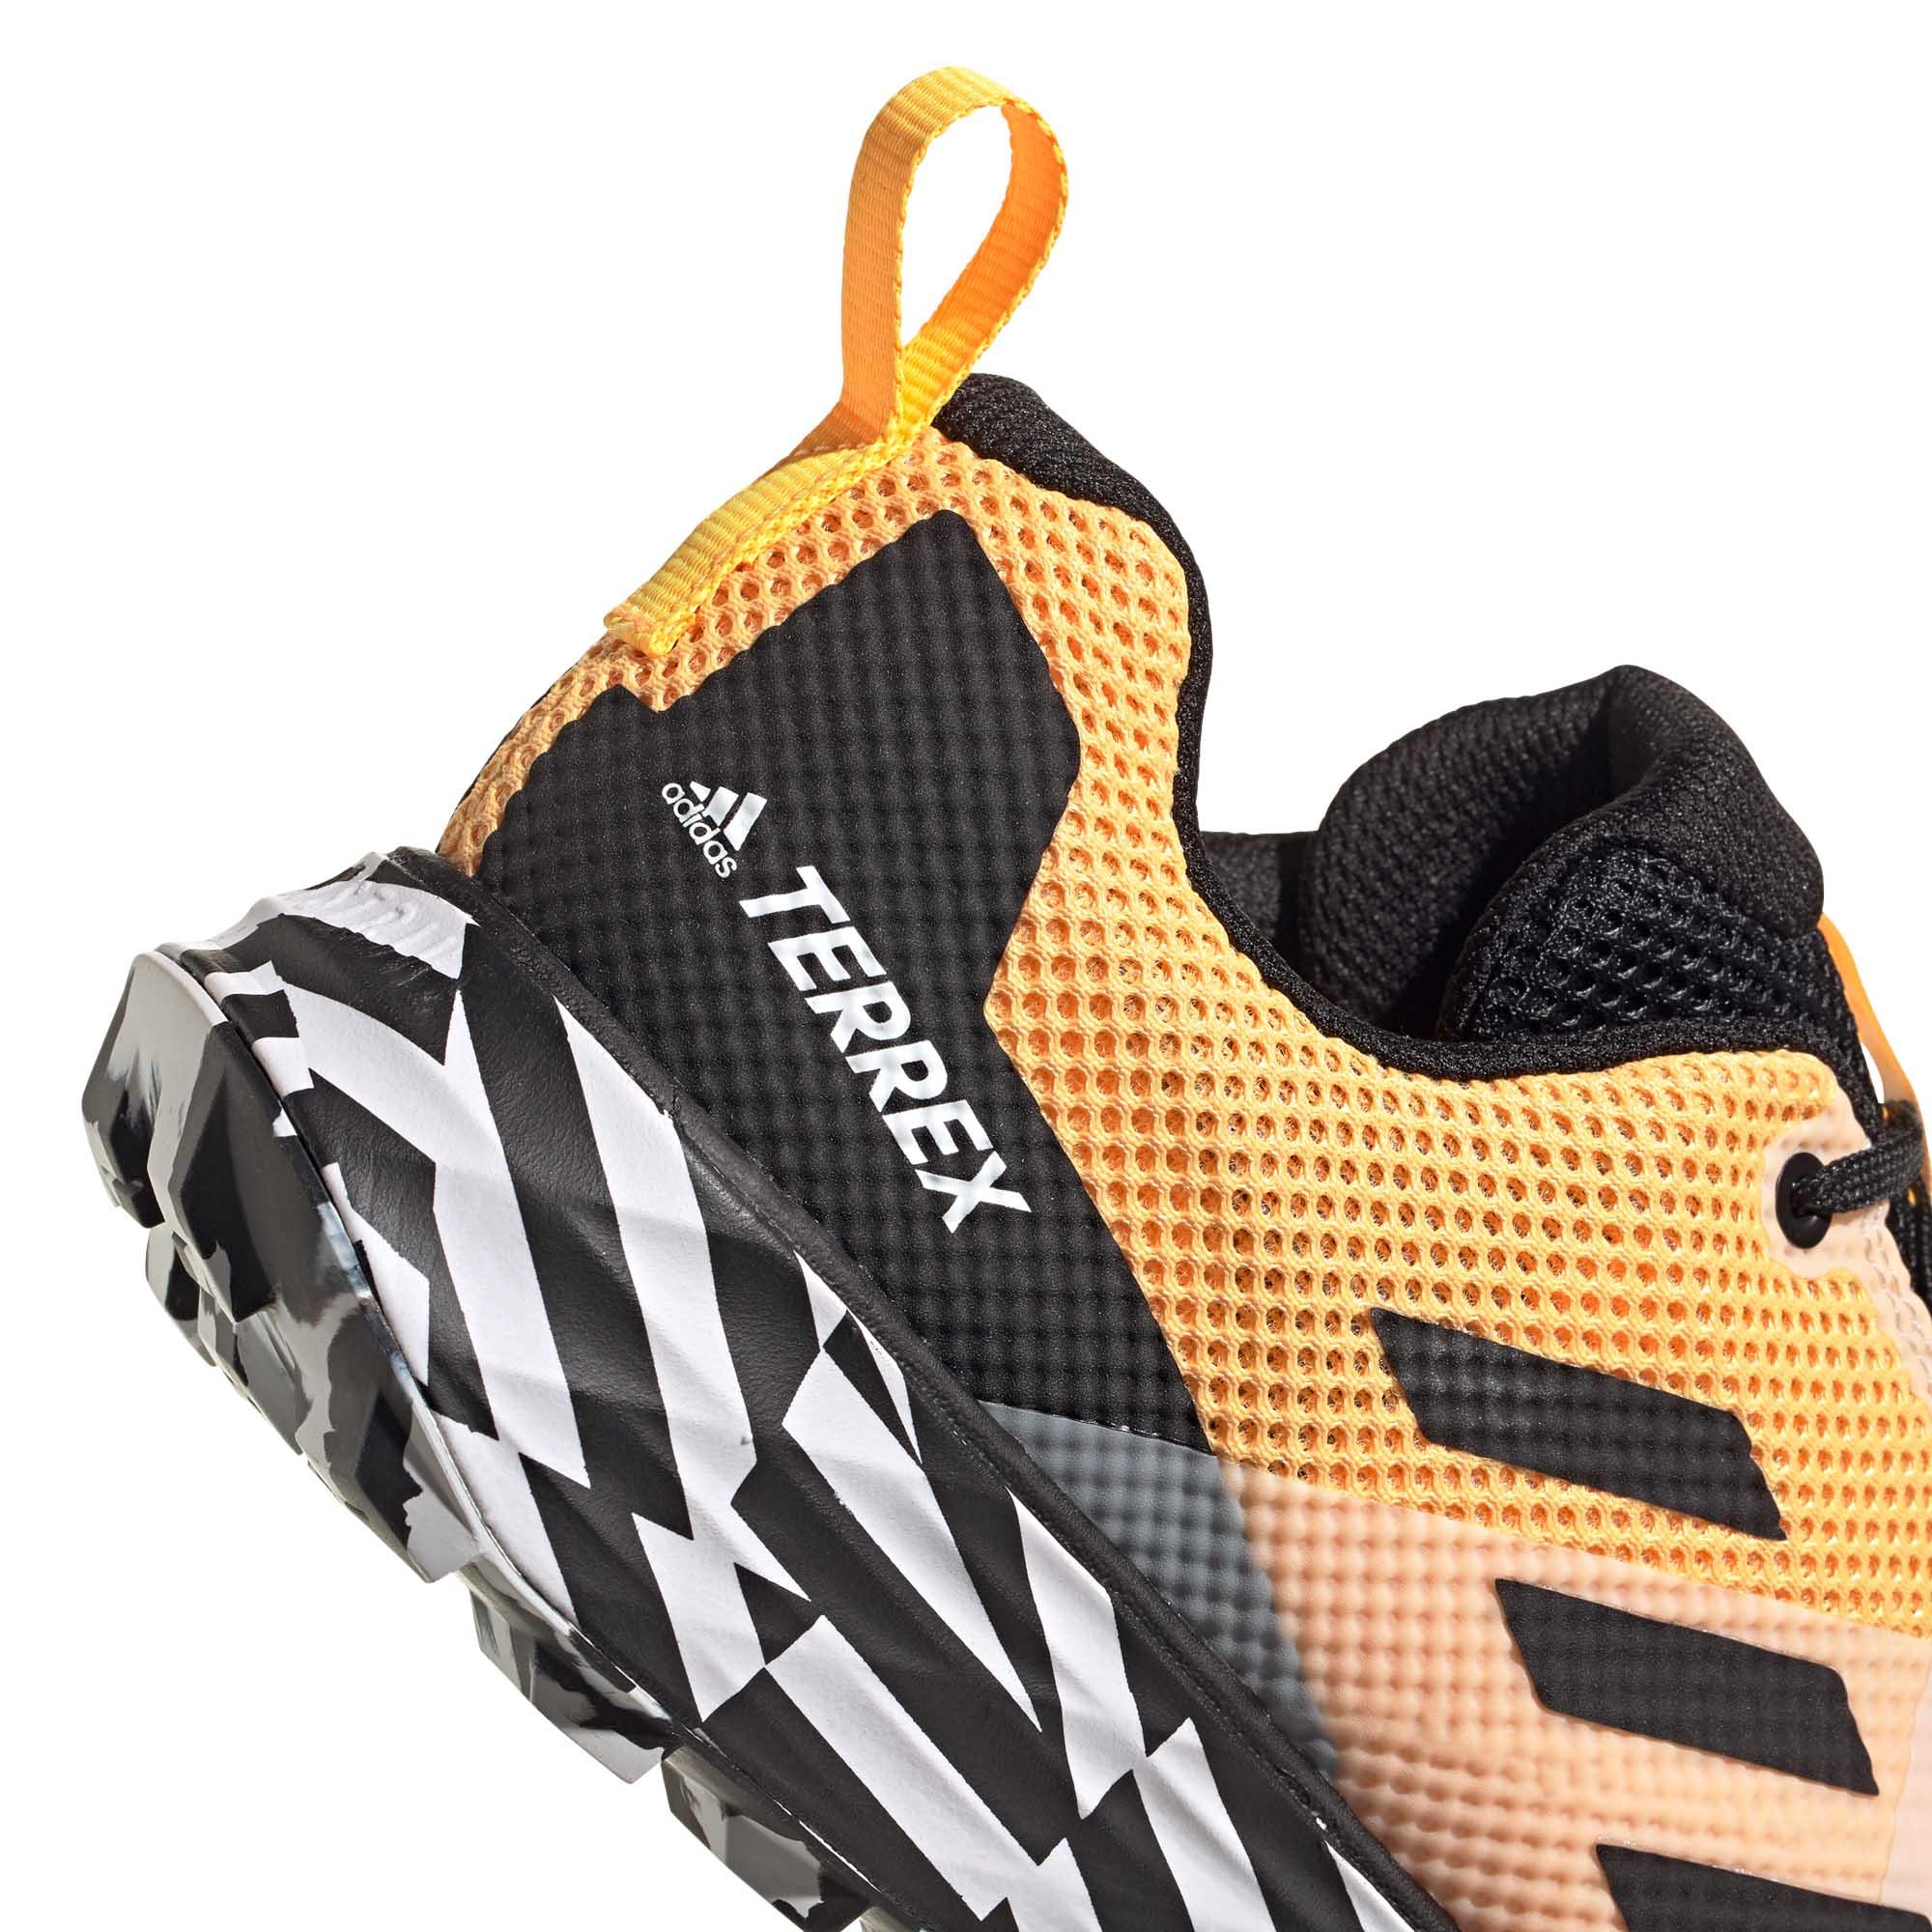 miniature 9 - Adidas Terrex deux homme trail running Trainer Shoe Or/Noir/Blanc